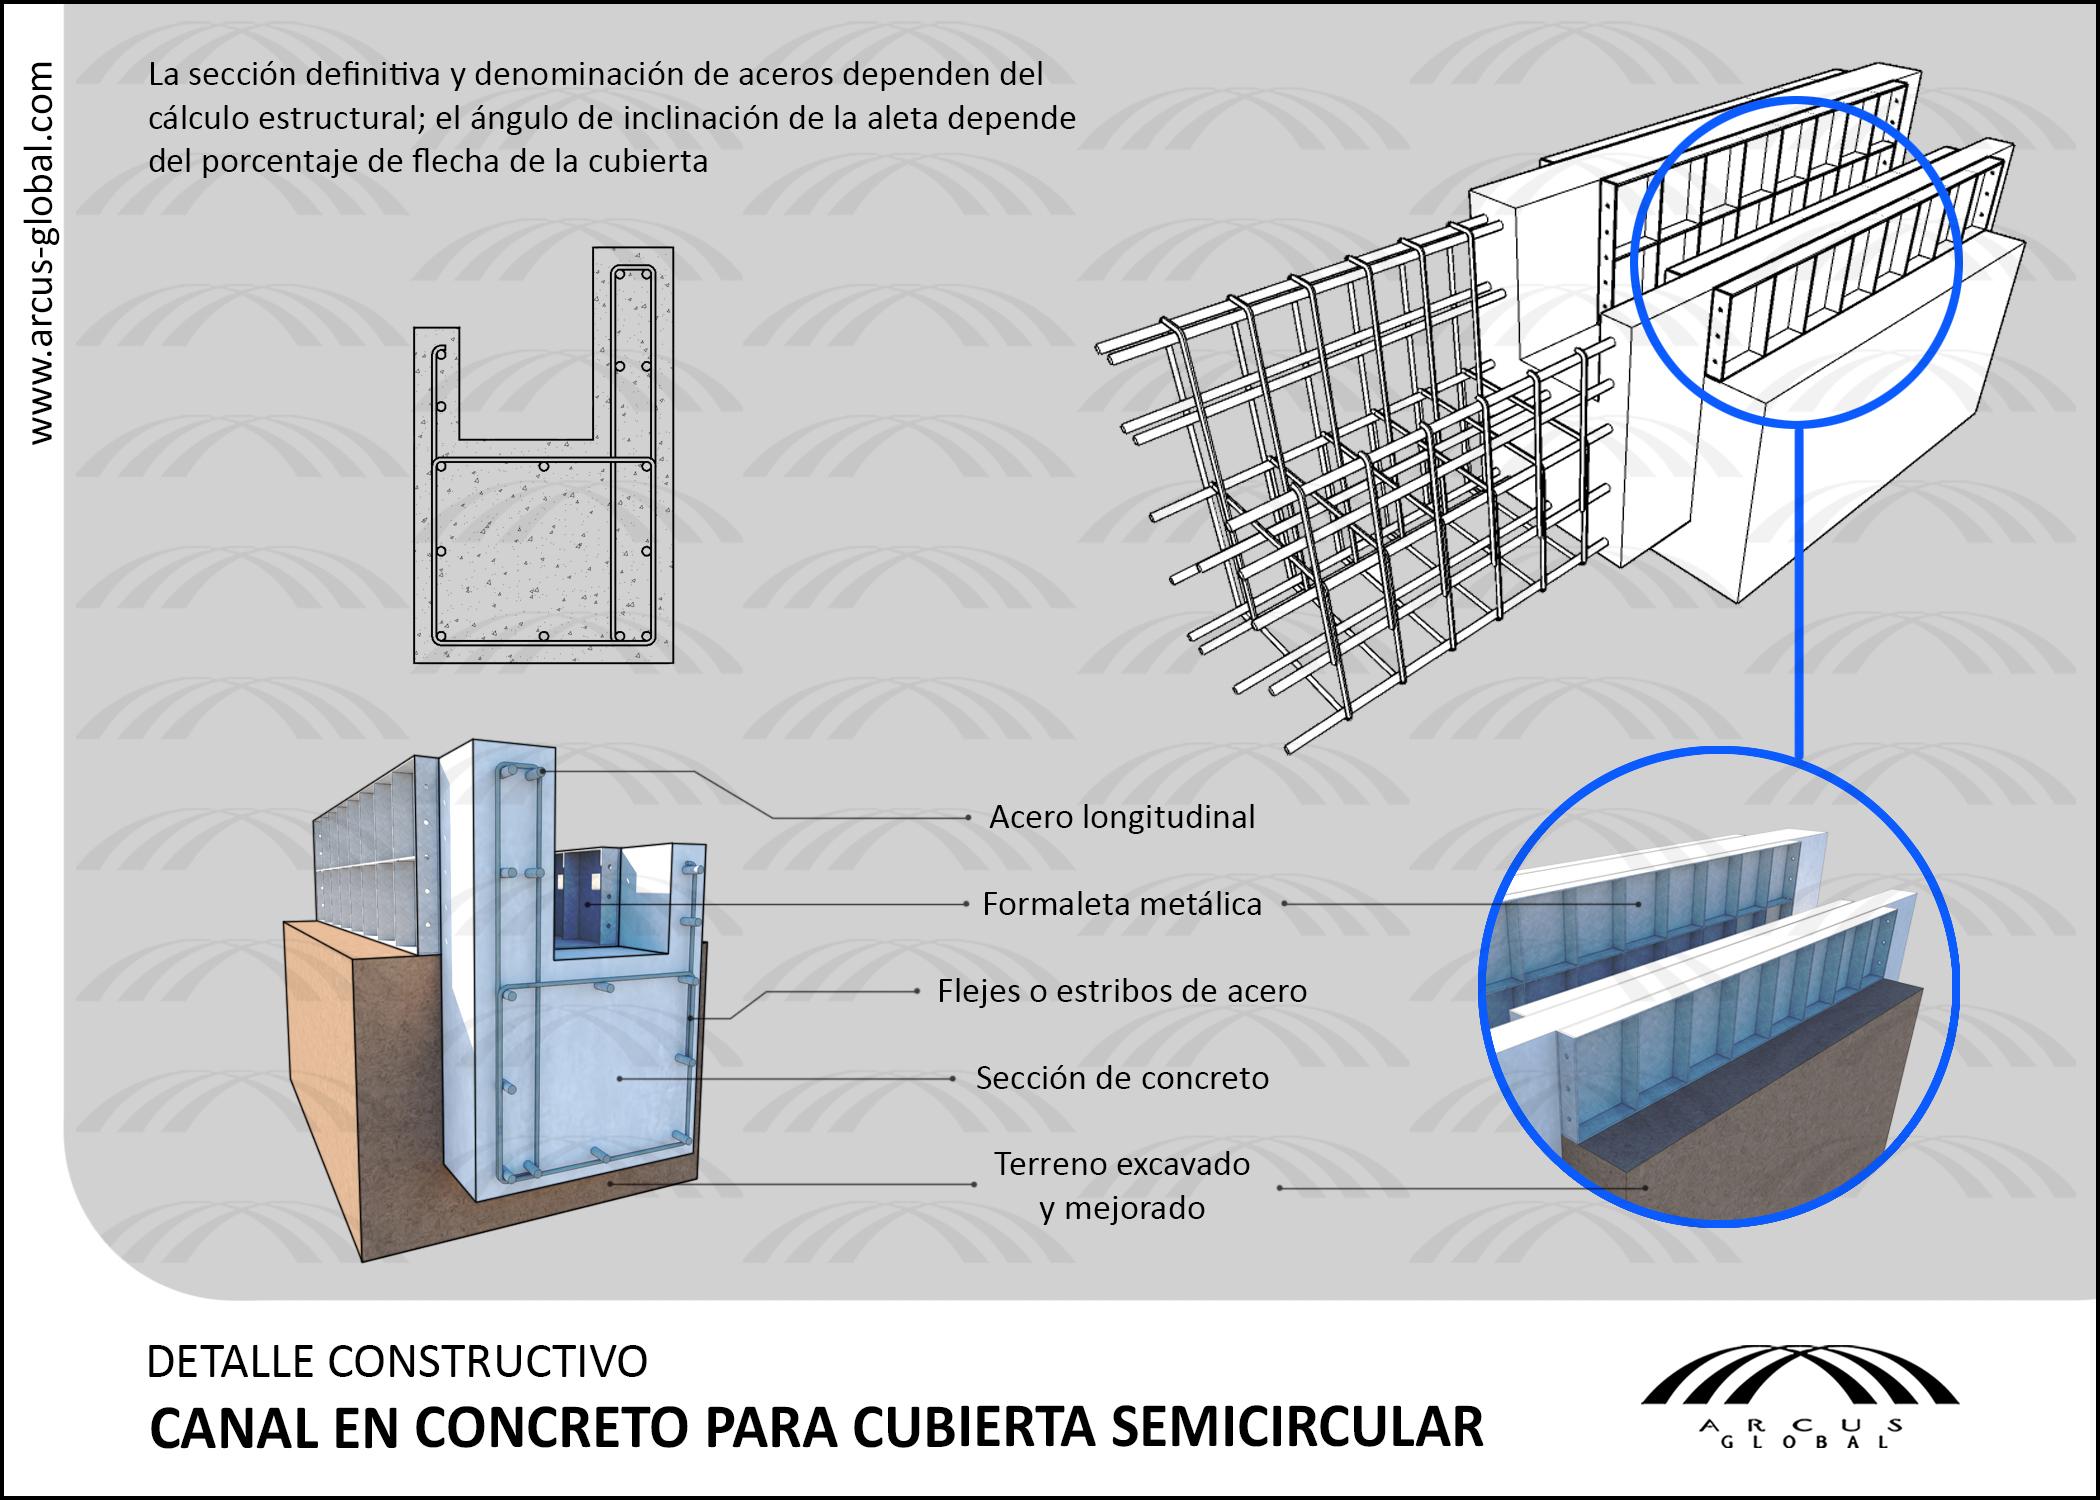 Ficha técnica: Canal en concreto para cubierta semicircular